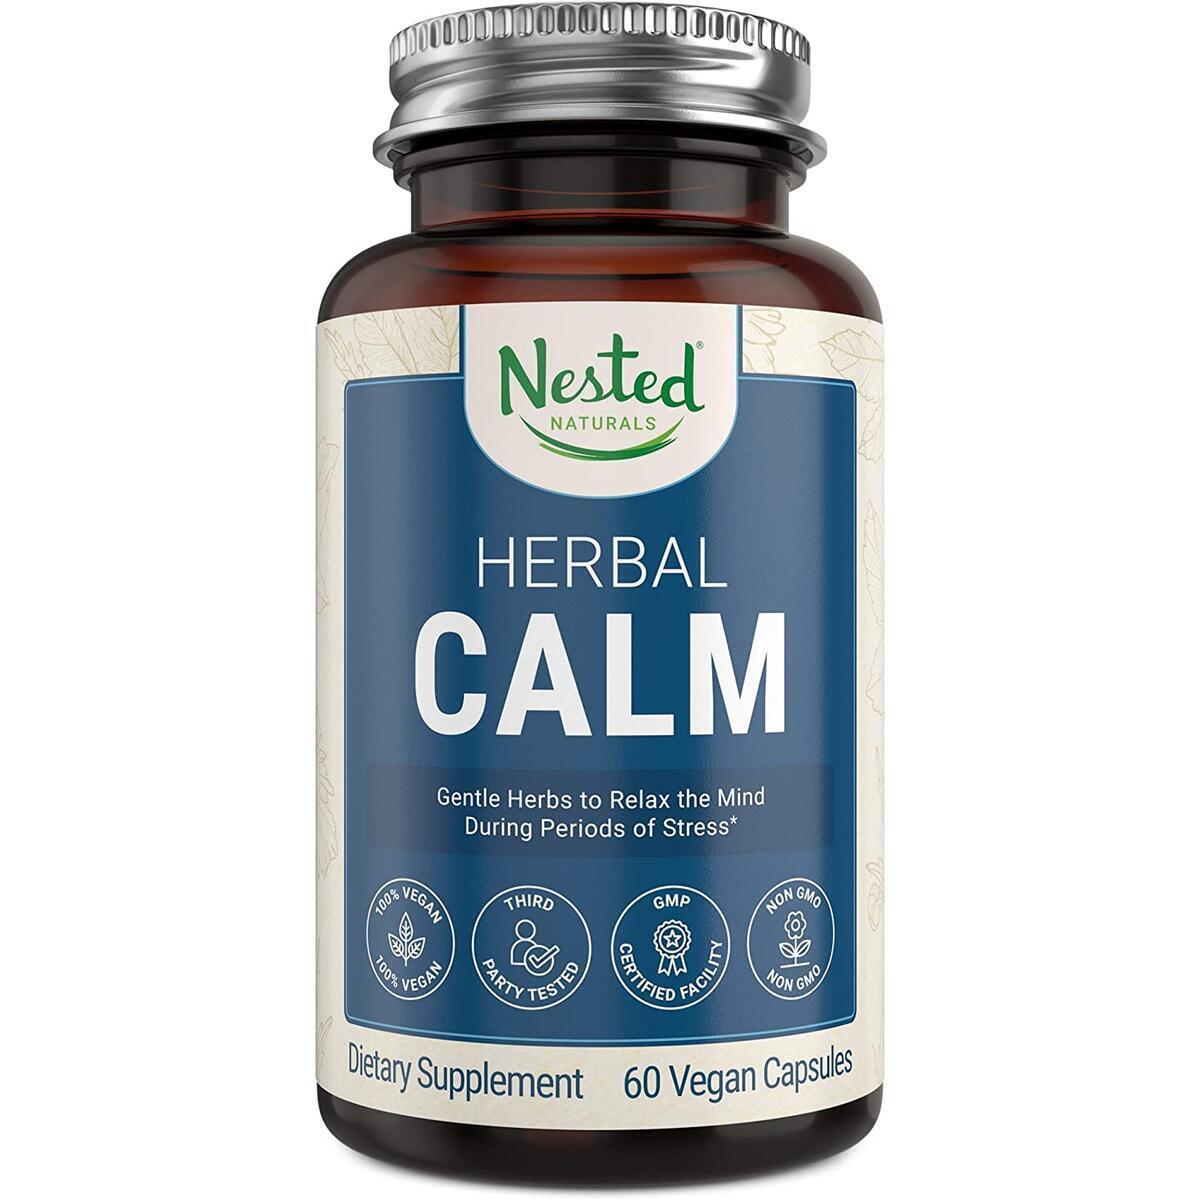 Nested Naturals Herbal Calm   Natural Anxiety and Stress Relief Supplement   Organic Ashwagandha Root Powder & Holy Basil Vitamin